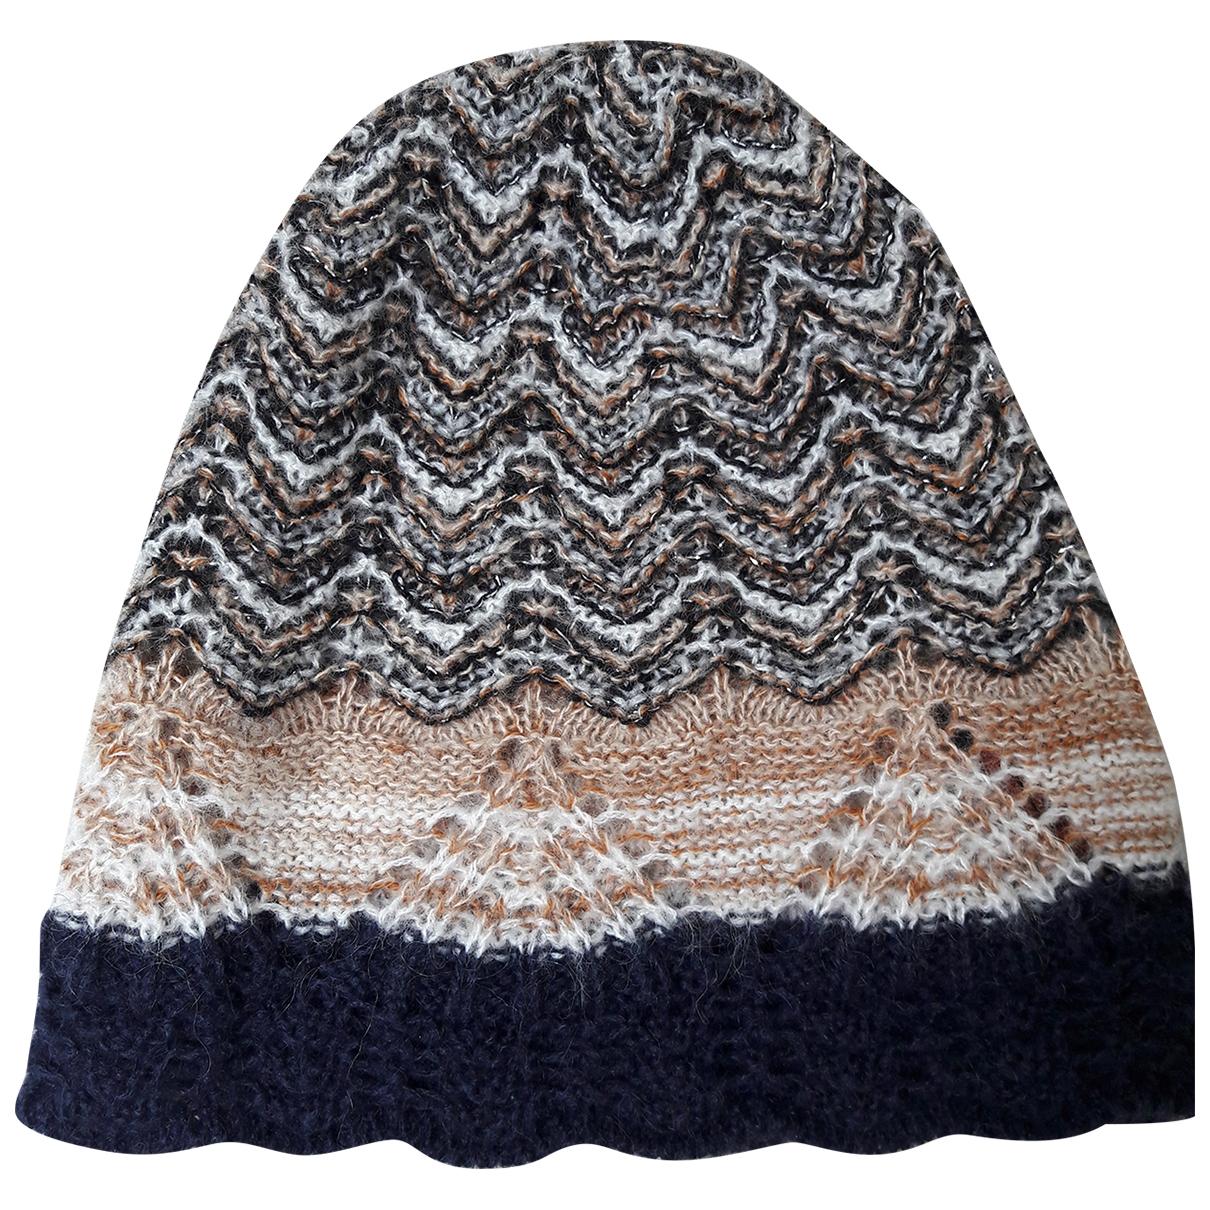 Missoni \N Wool hat for Women S International